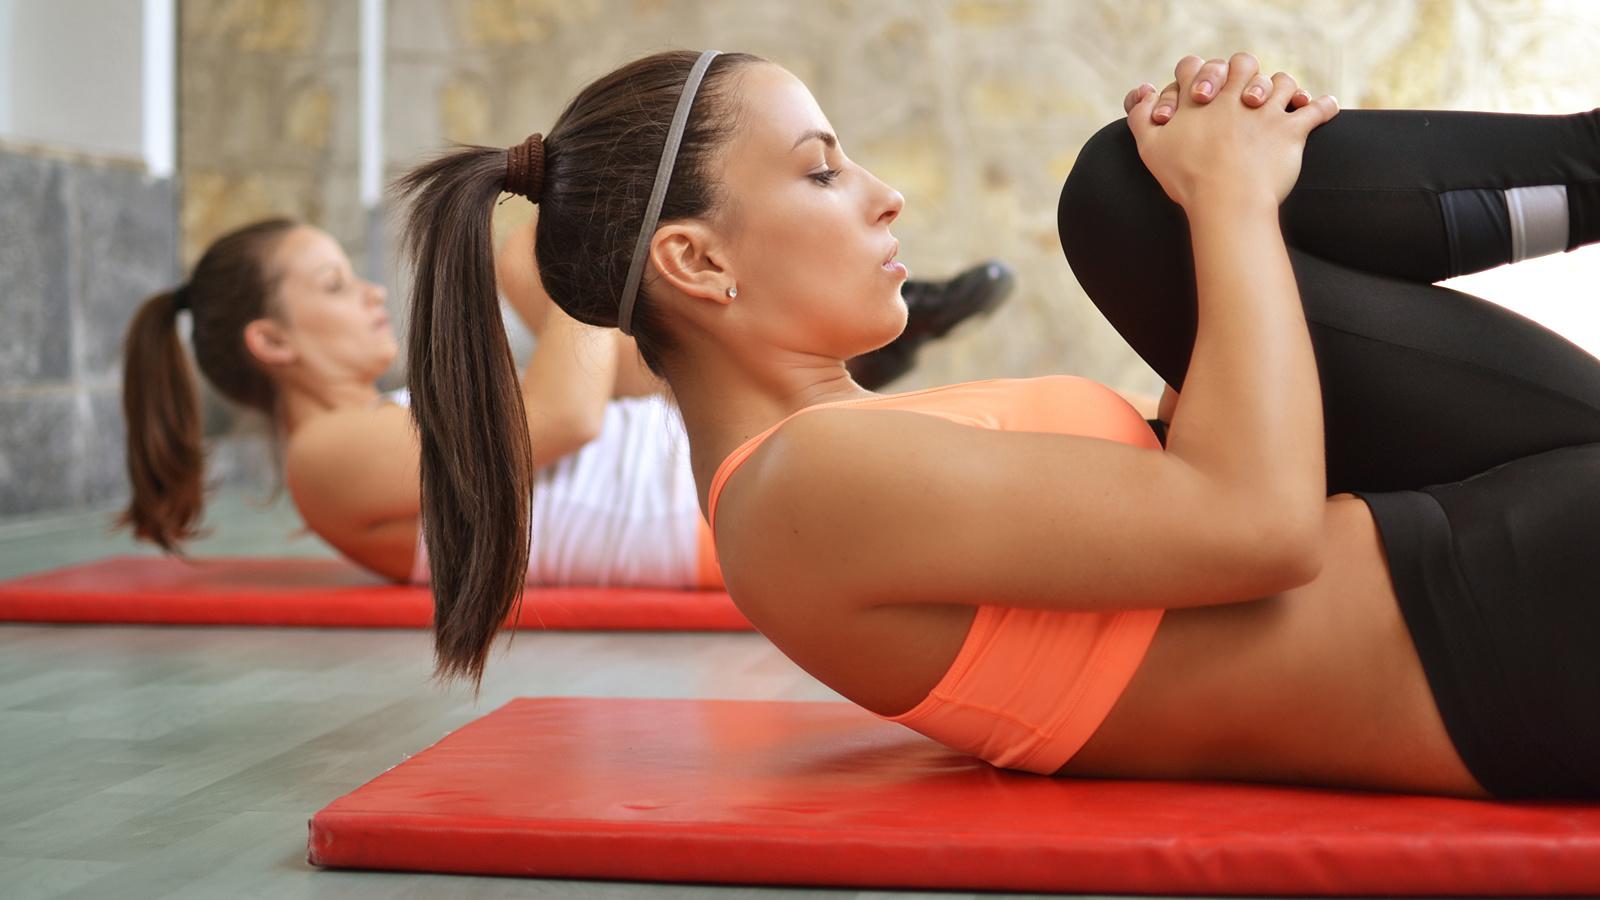 фитнес, девушки, упражнение, спорт, спортзал, fitness, womens, exercise, sport, gymnasium